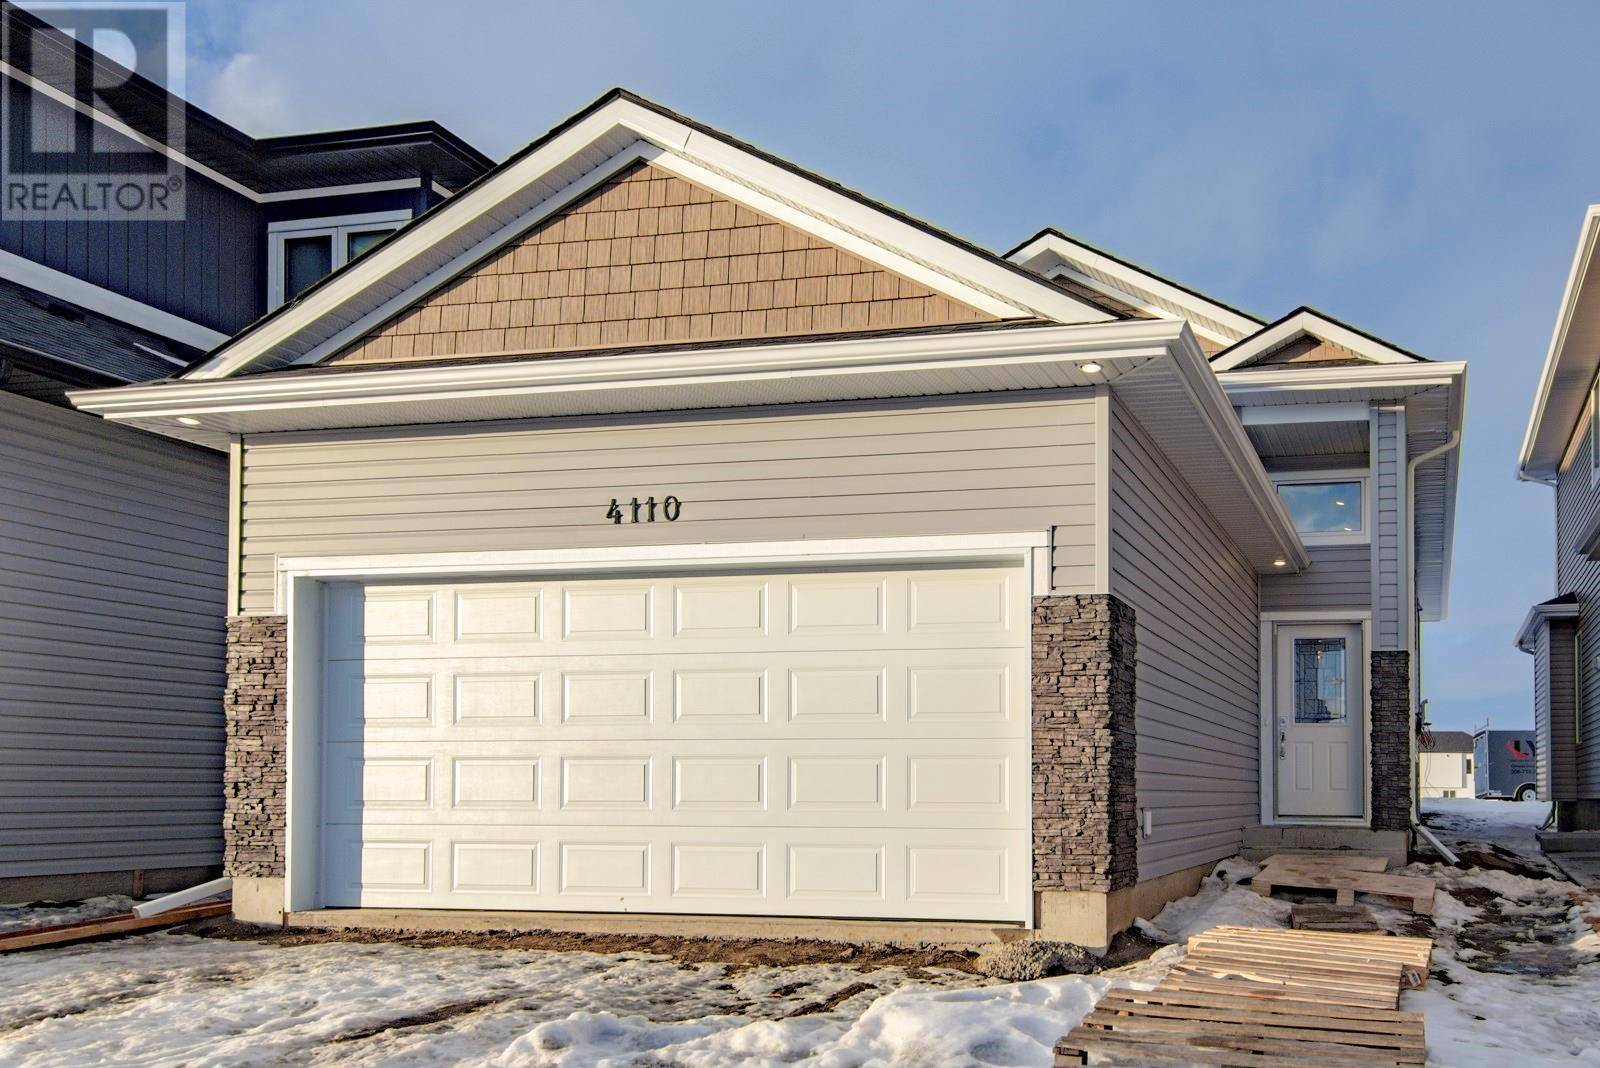 House for sale at 4110 Diefenbaker Dr Saskatoon Saskatchewan - MLS: SK778551